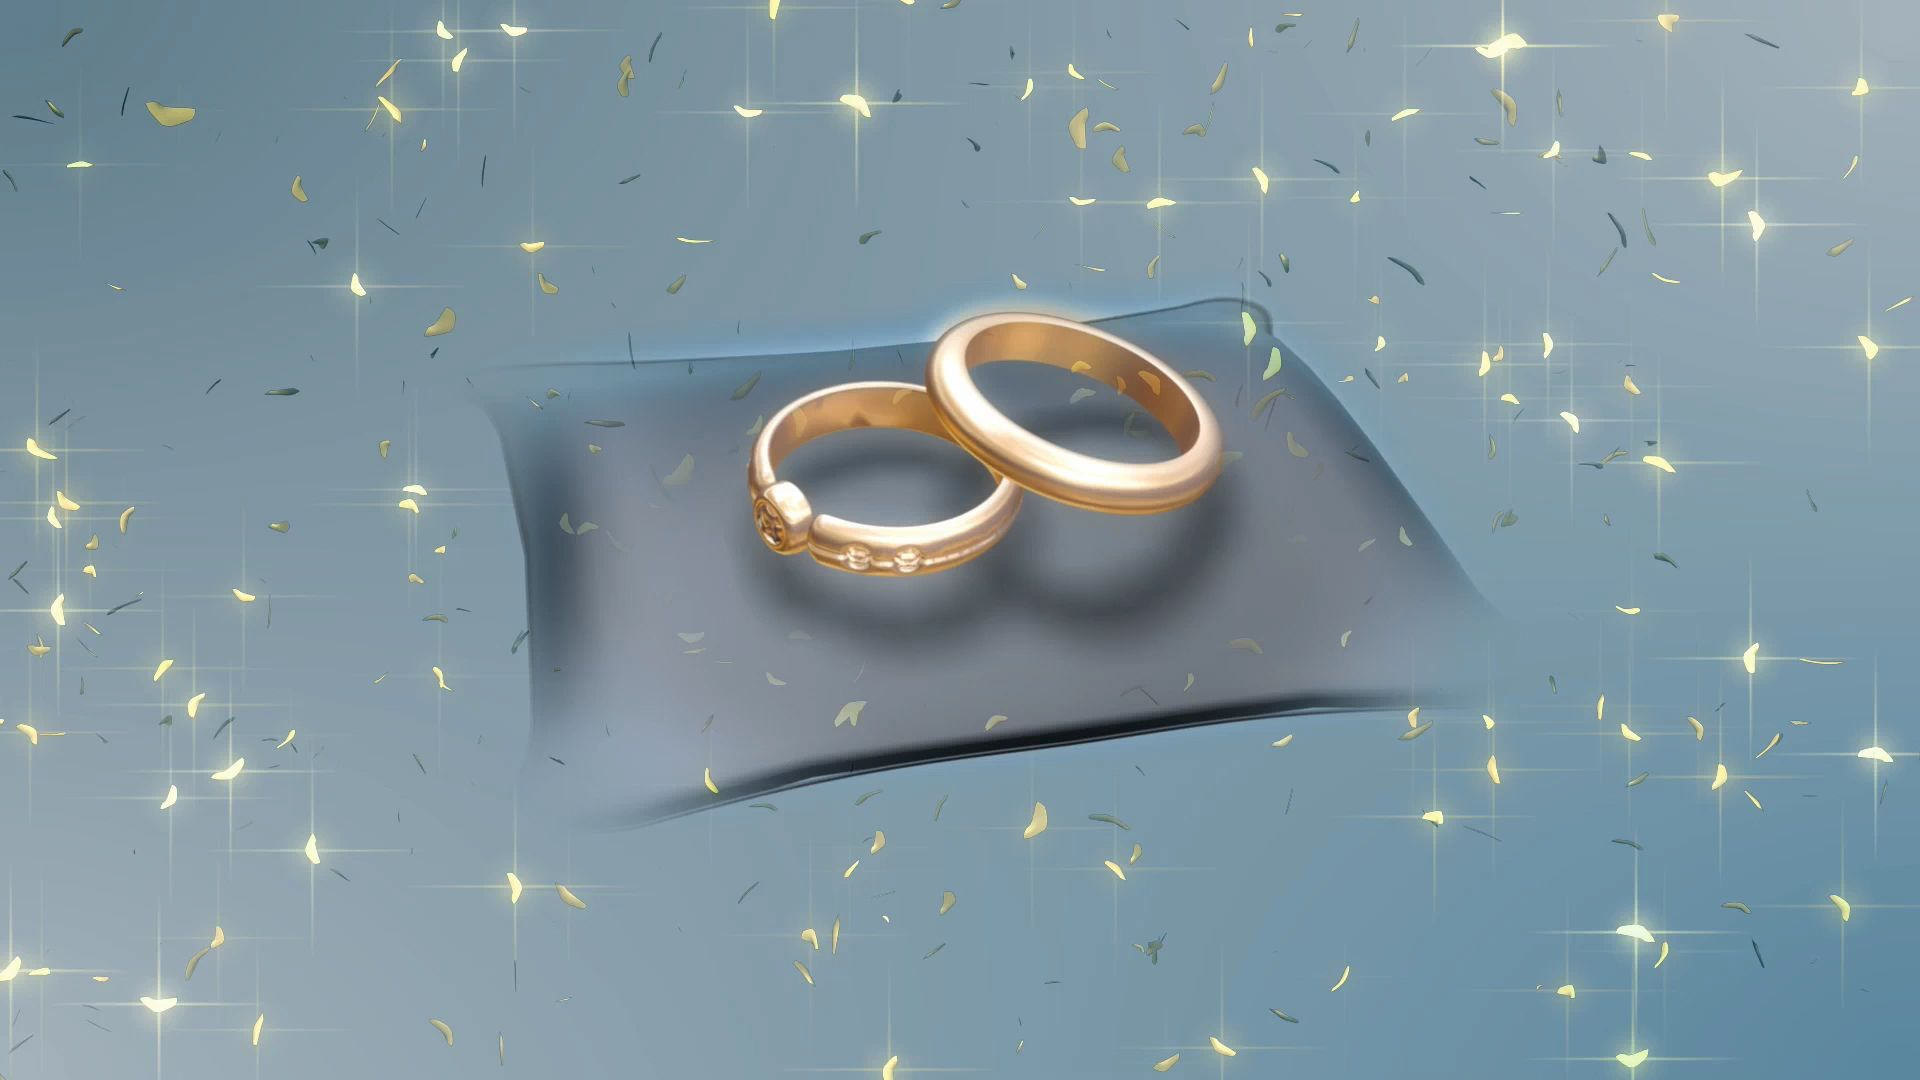 Love Ring Wallpaper Hd : Kerala Wedding Photo Backgrounds Hd Wedding Photography Website 1600x1200 Wedding Backgrounds ...